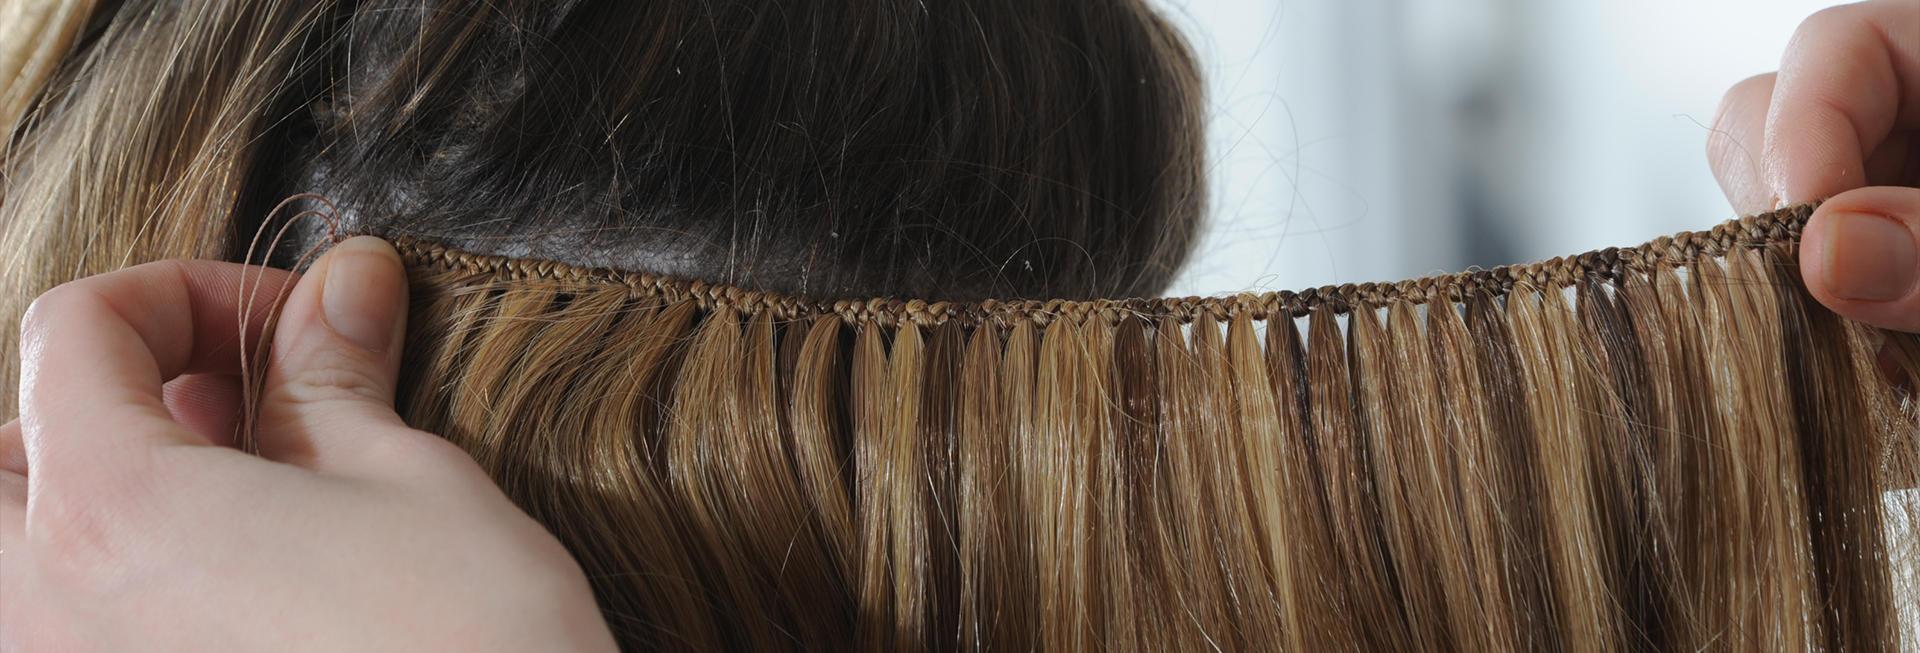 Verrassend Haarverlenging met écht Europees, onbehandeld haar   Topweave.nl FU-46